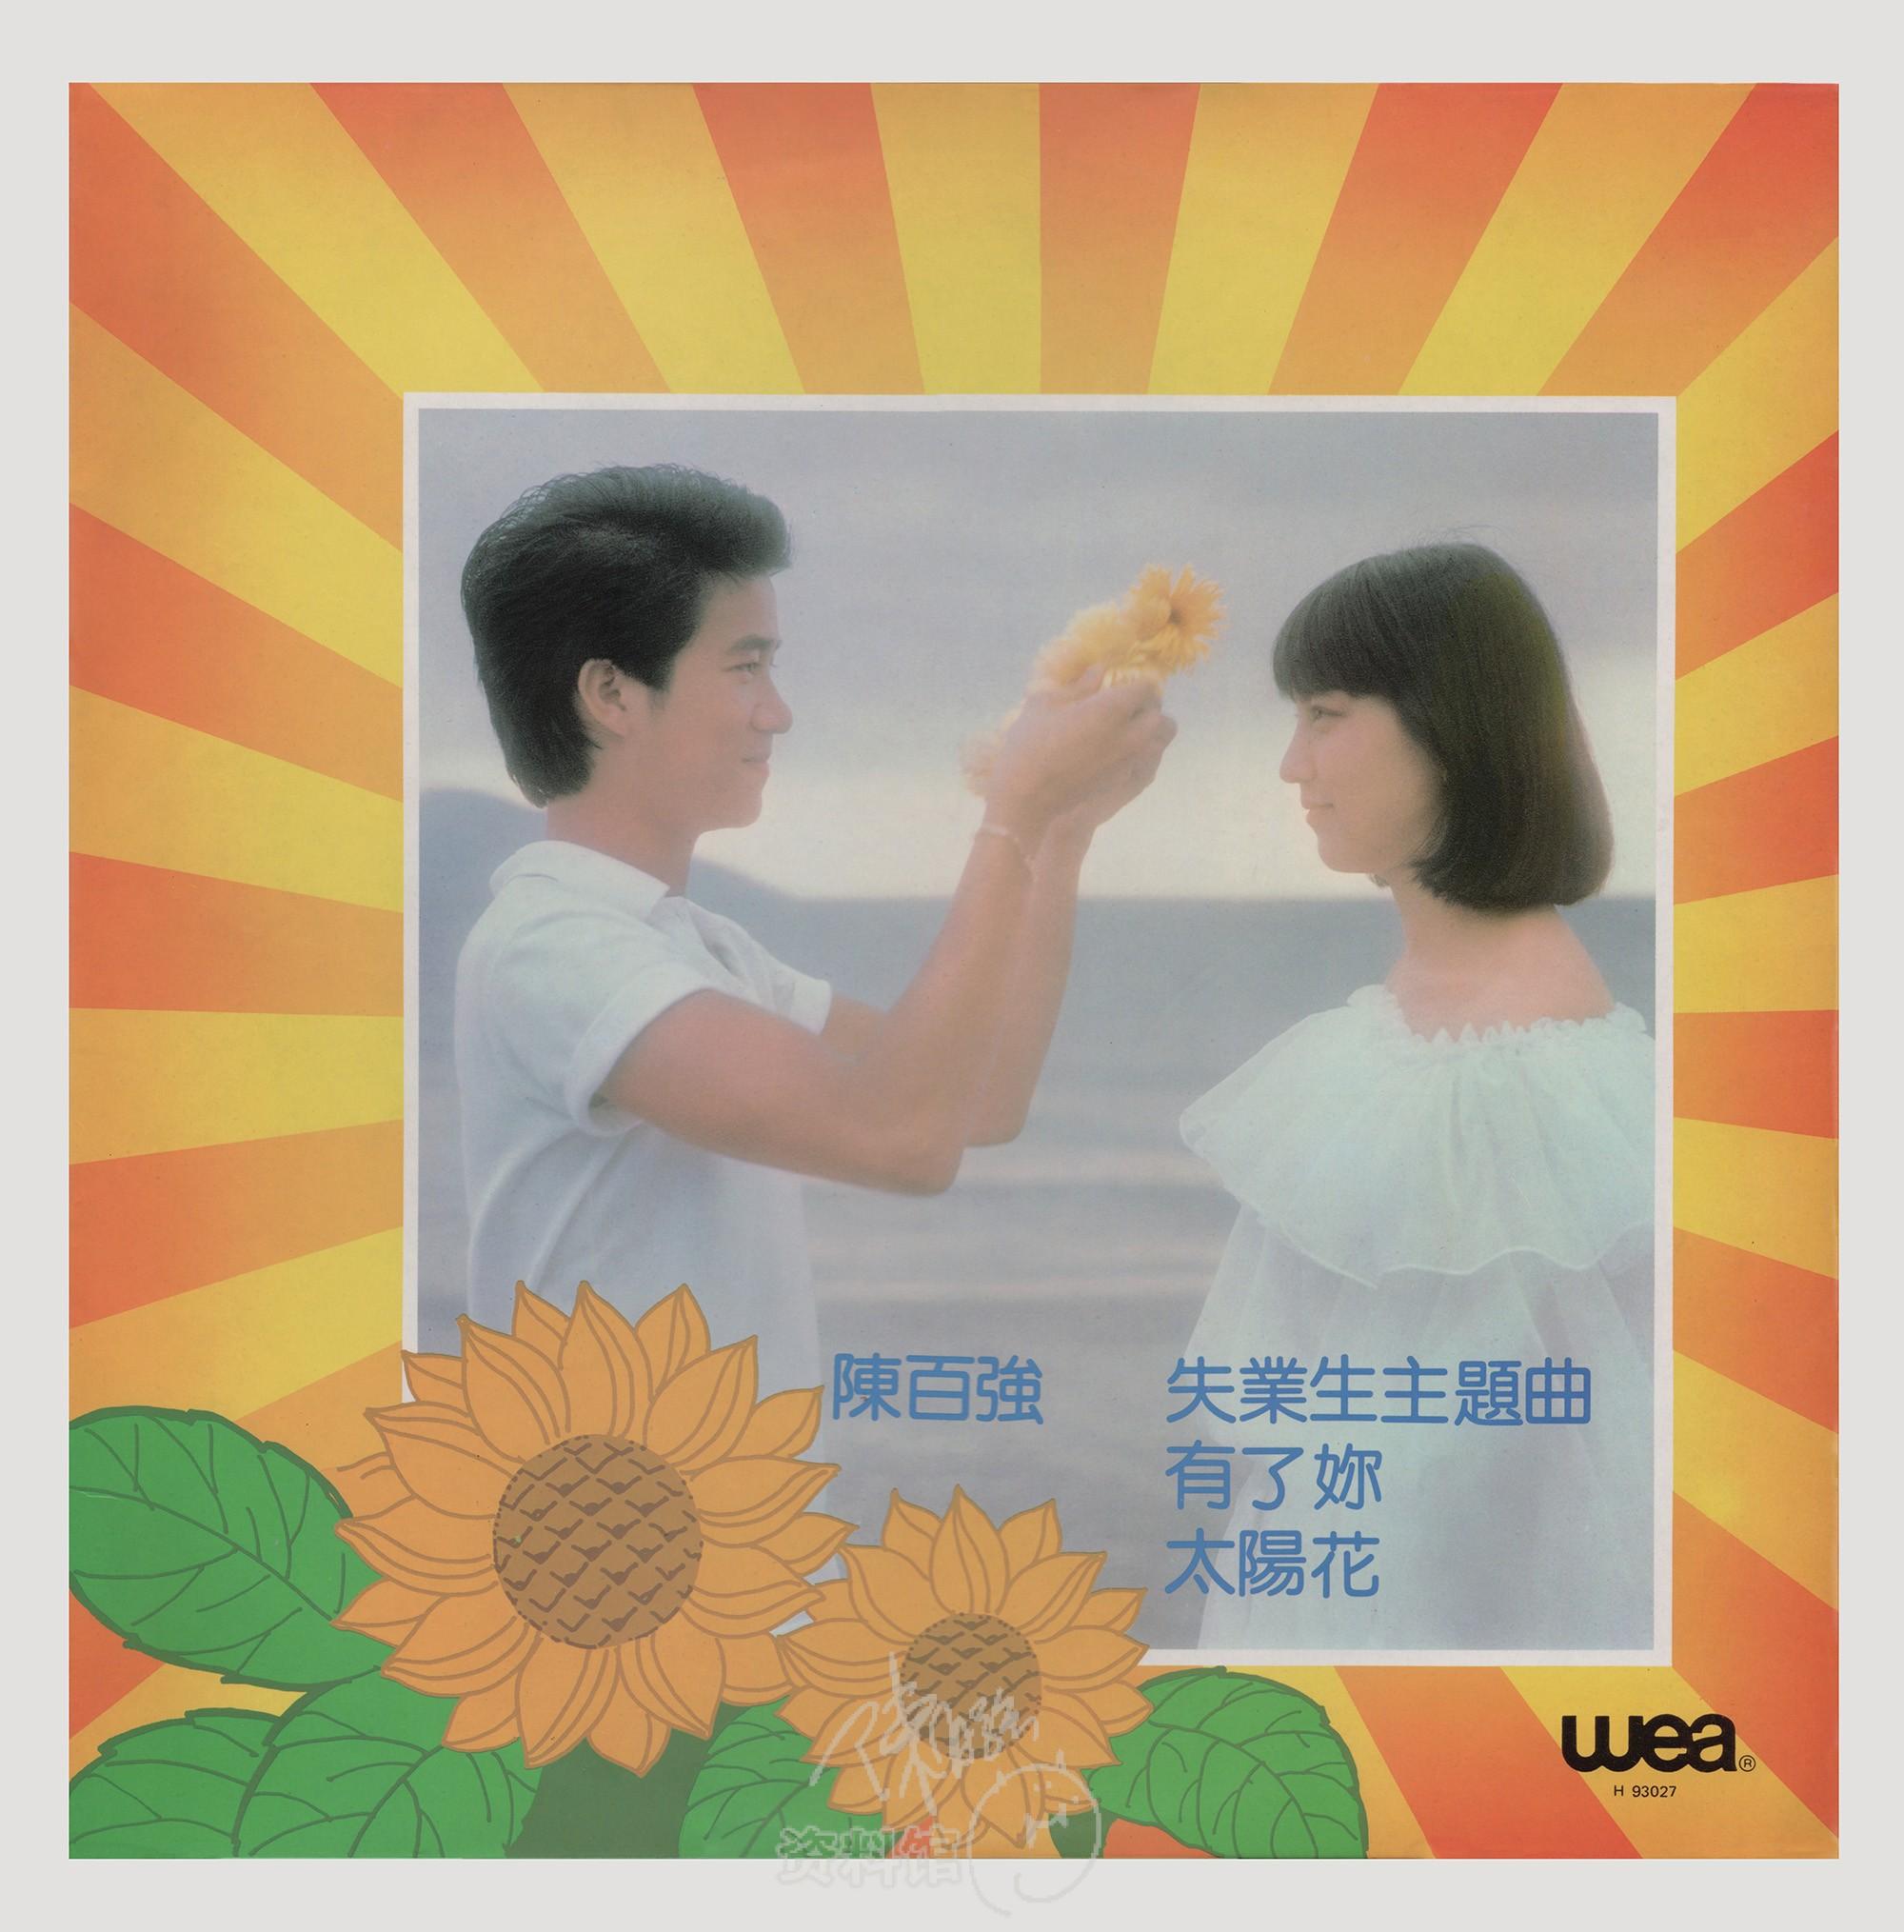 cd碟花了_1981 华纳《陈百强》(有了你、太阳花)   陈百强资料馆CN